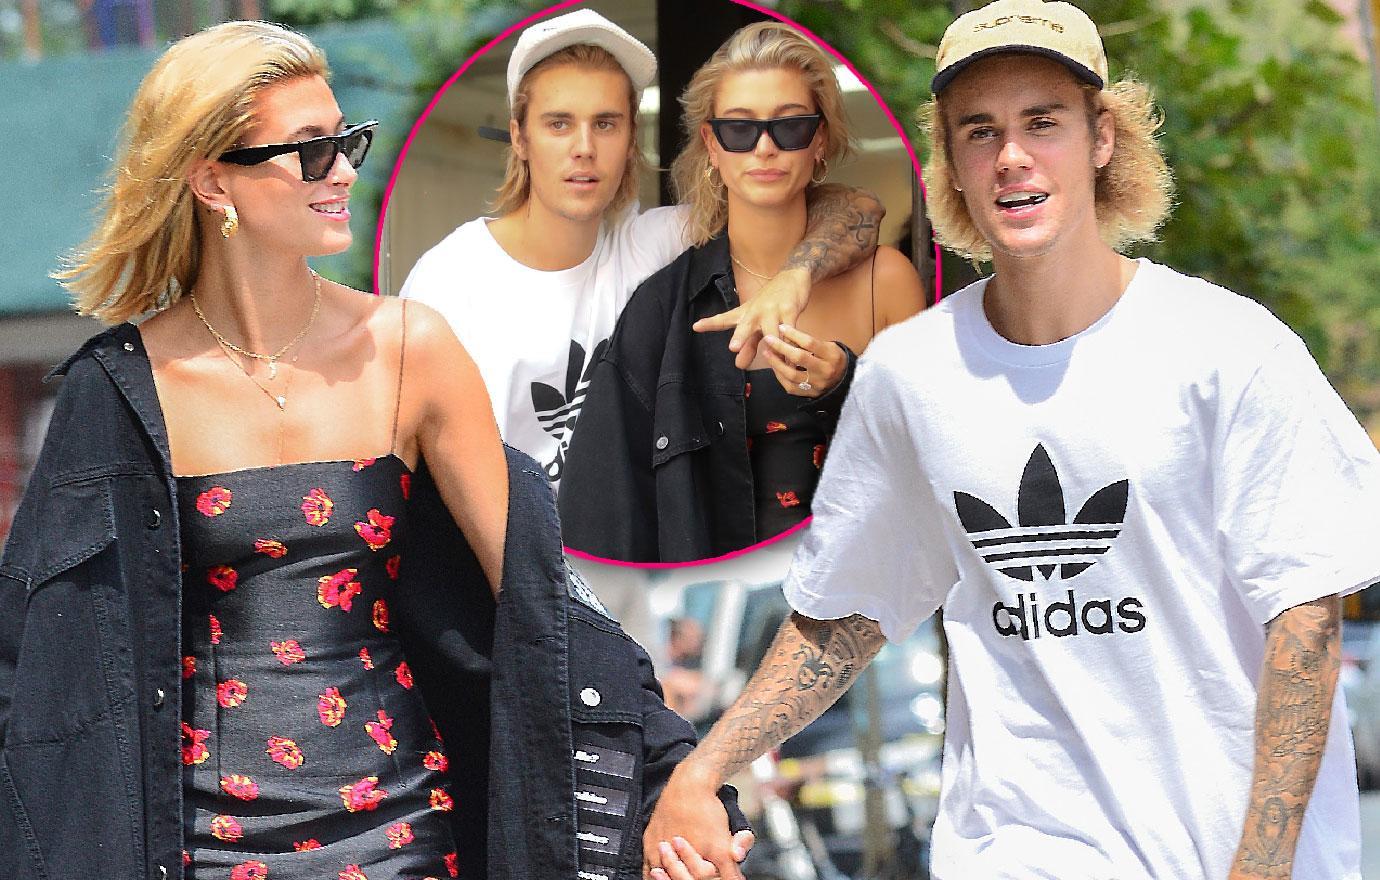 Justin Bieber And Hailey Baldwin Go On New York Date Night